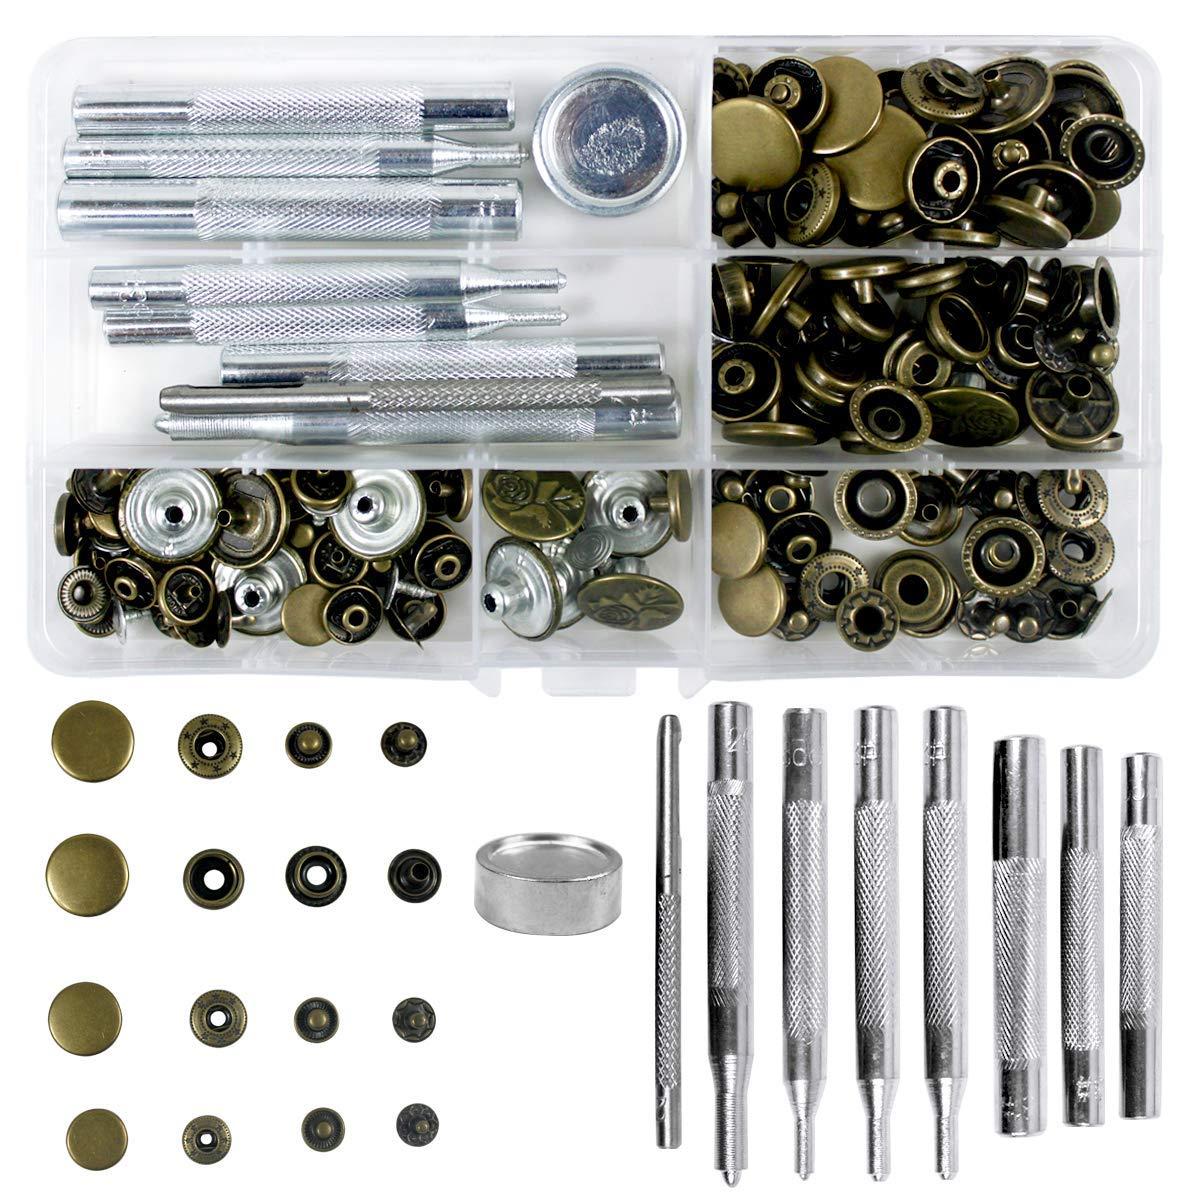 1//2 Length 100 Piece Box 18-8 Stainless Steel Semi-Tubular Rivet 1//2 Head Diam 1//4 Body Diam Truss Head Style